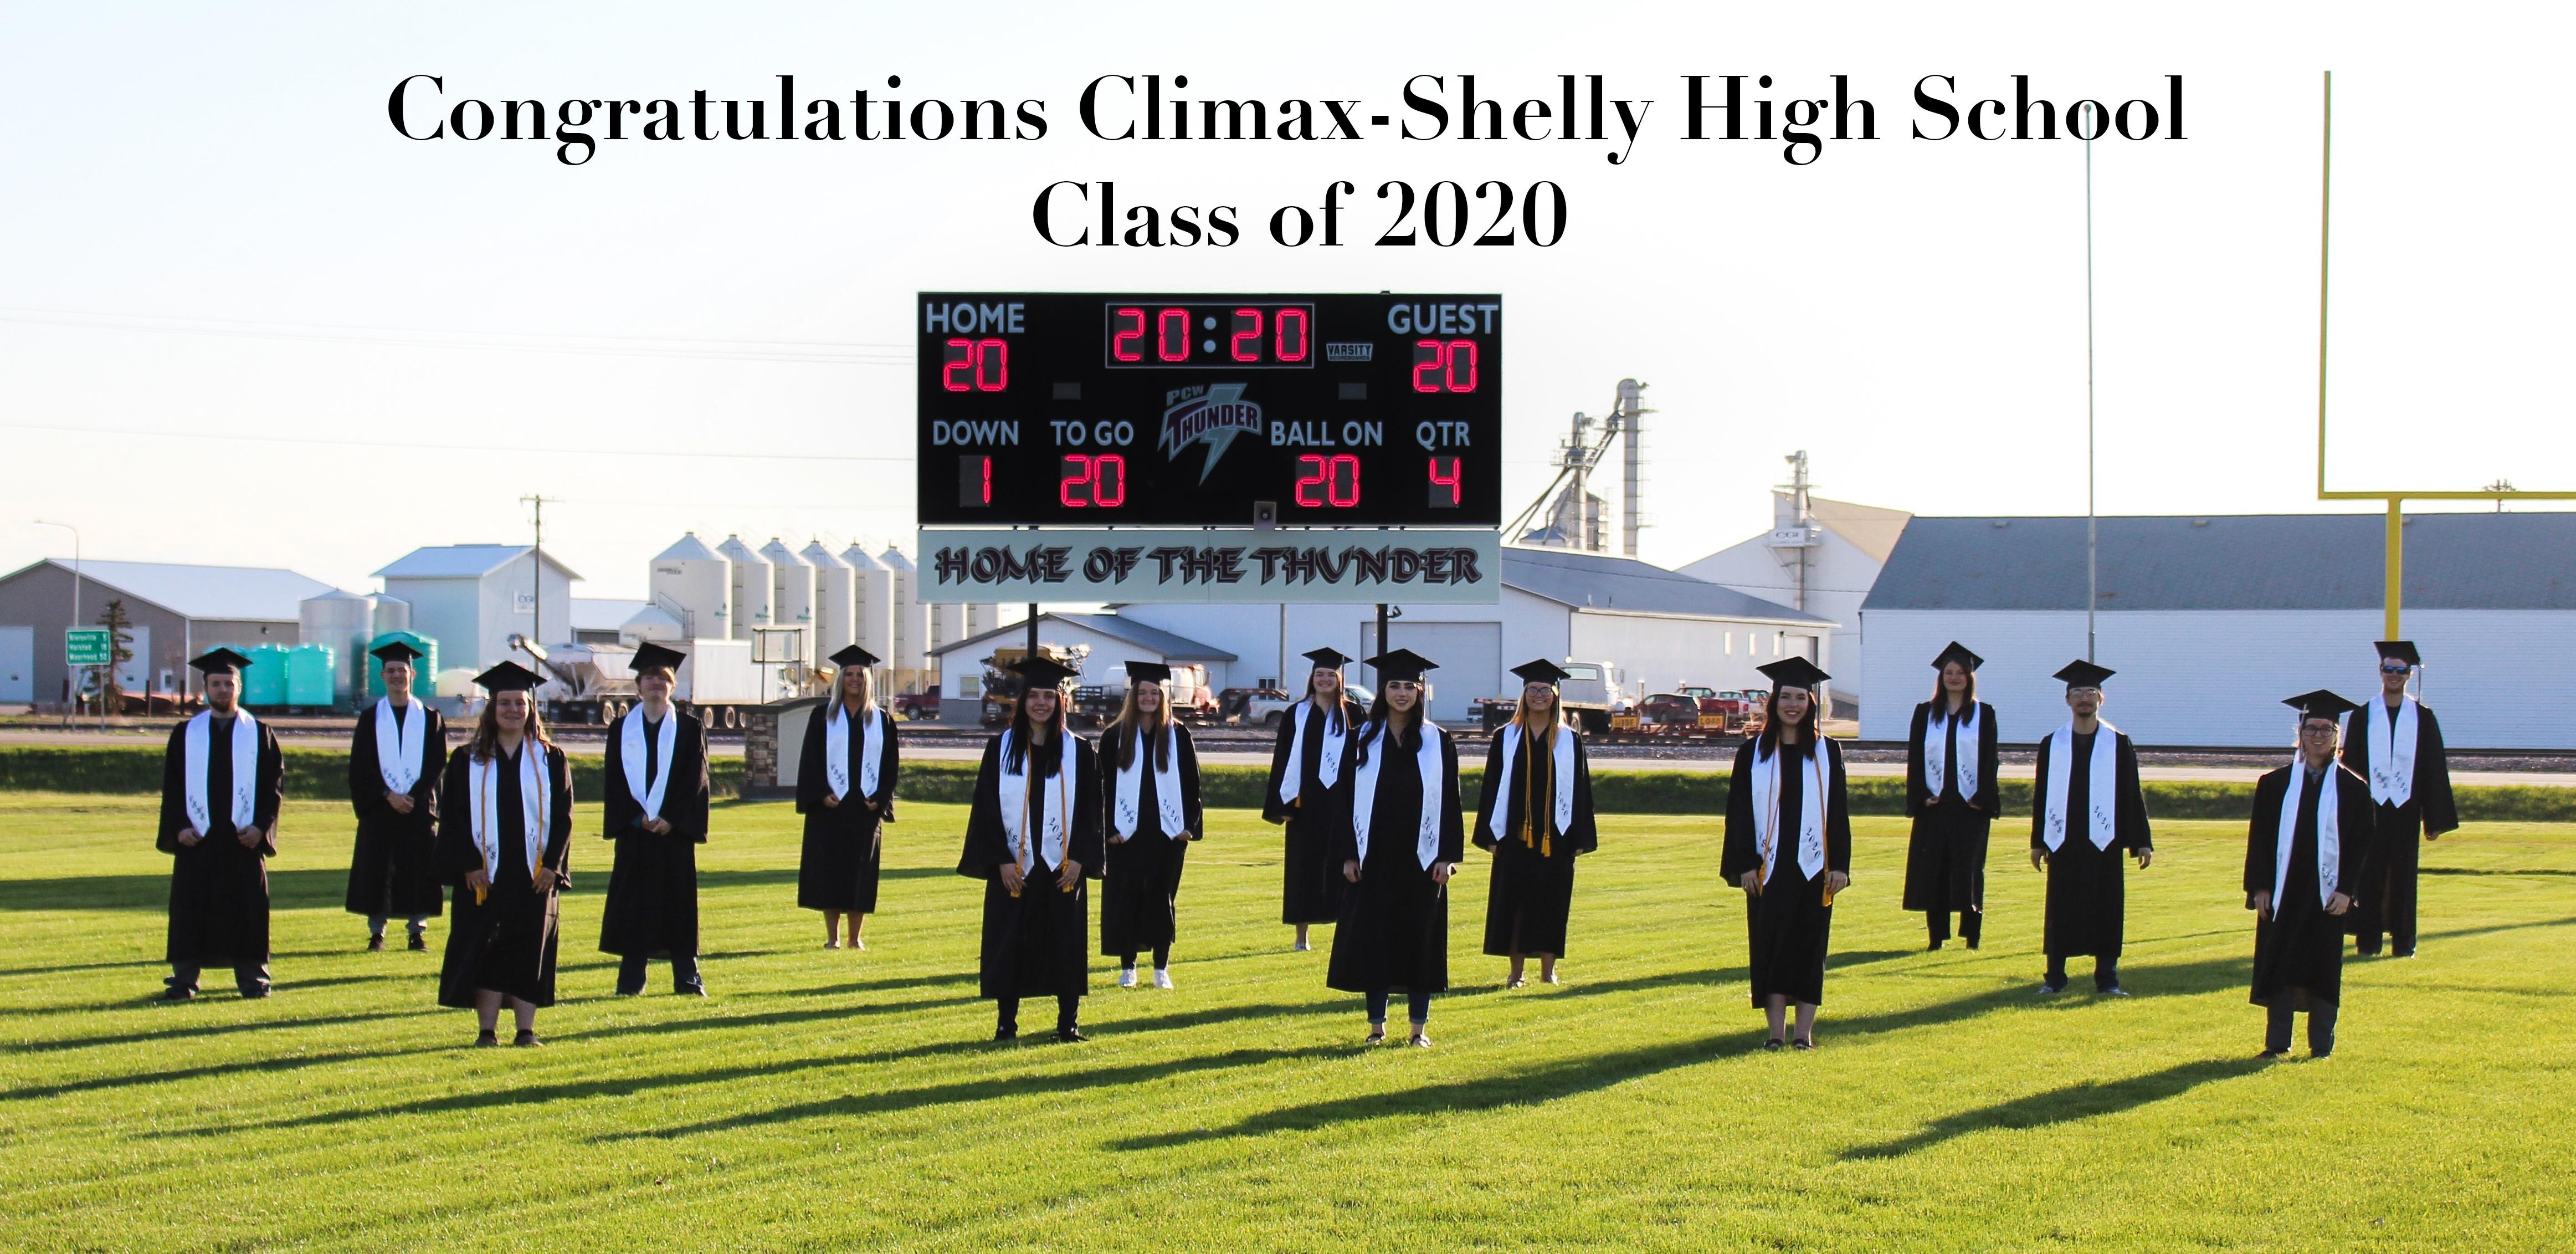 Class of 2020 Congrats